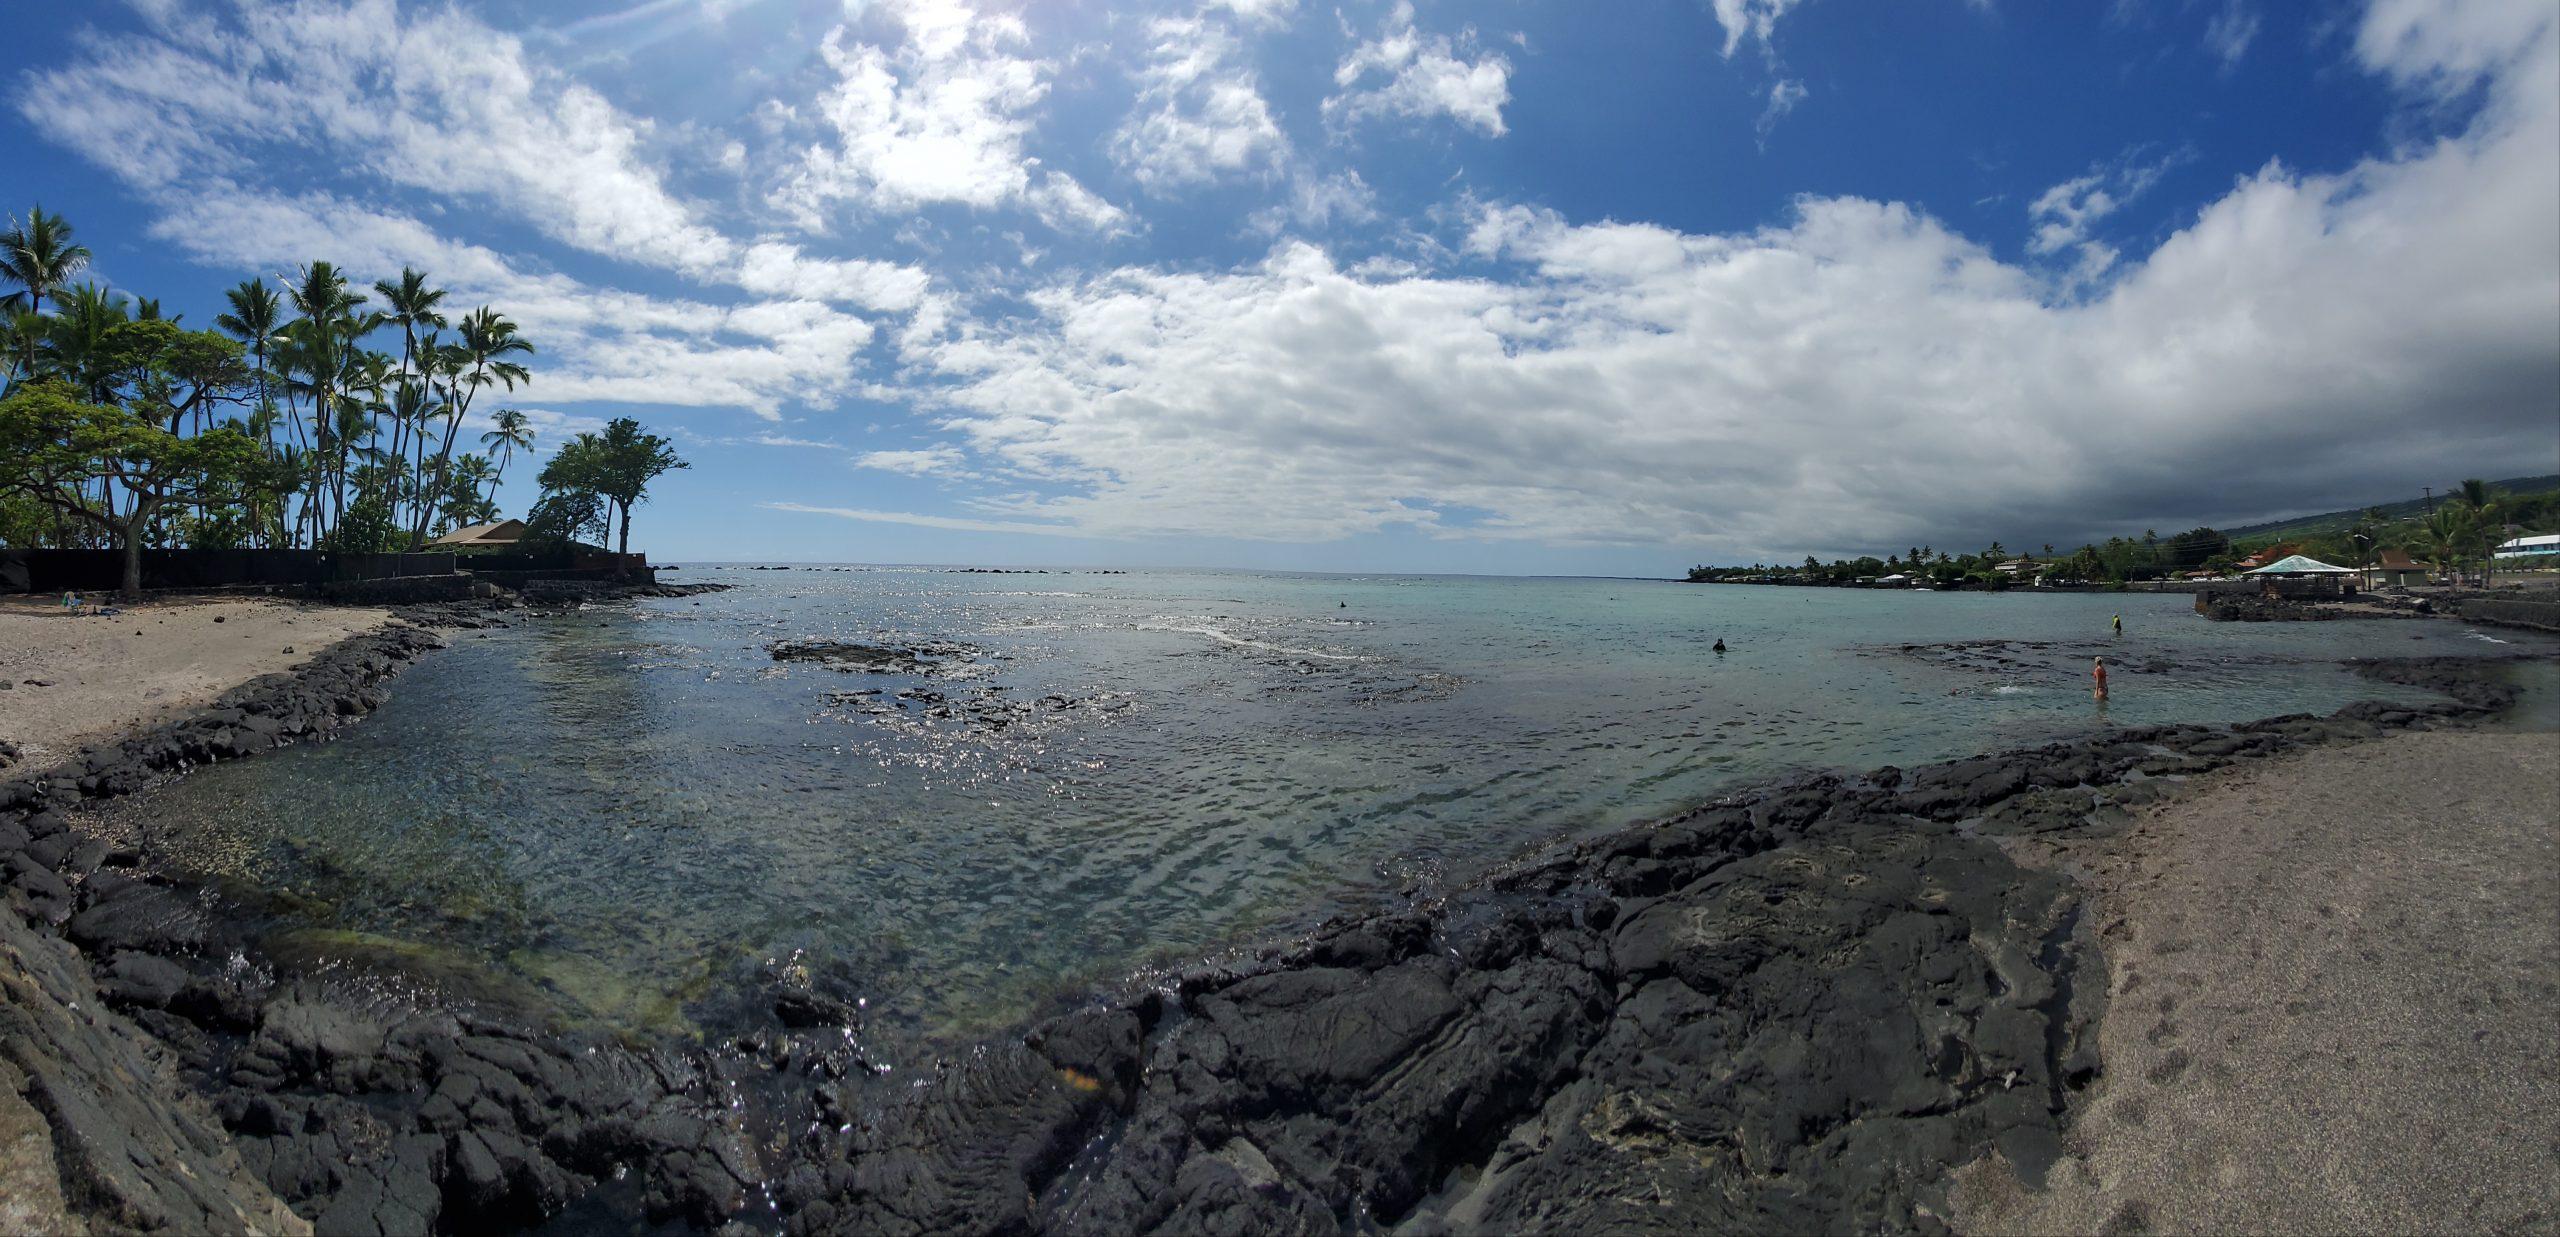 Landscape photo of Kahaluu Beach in Hawaii